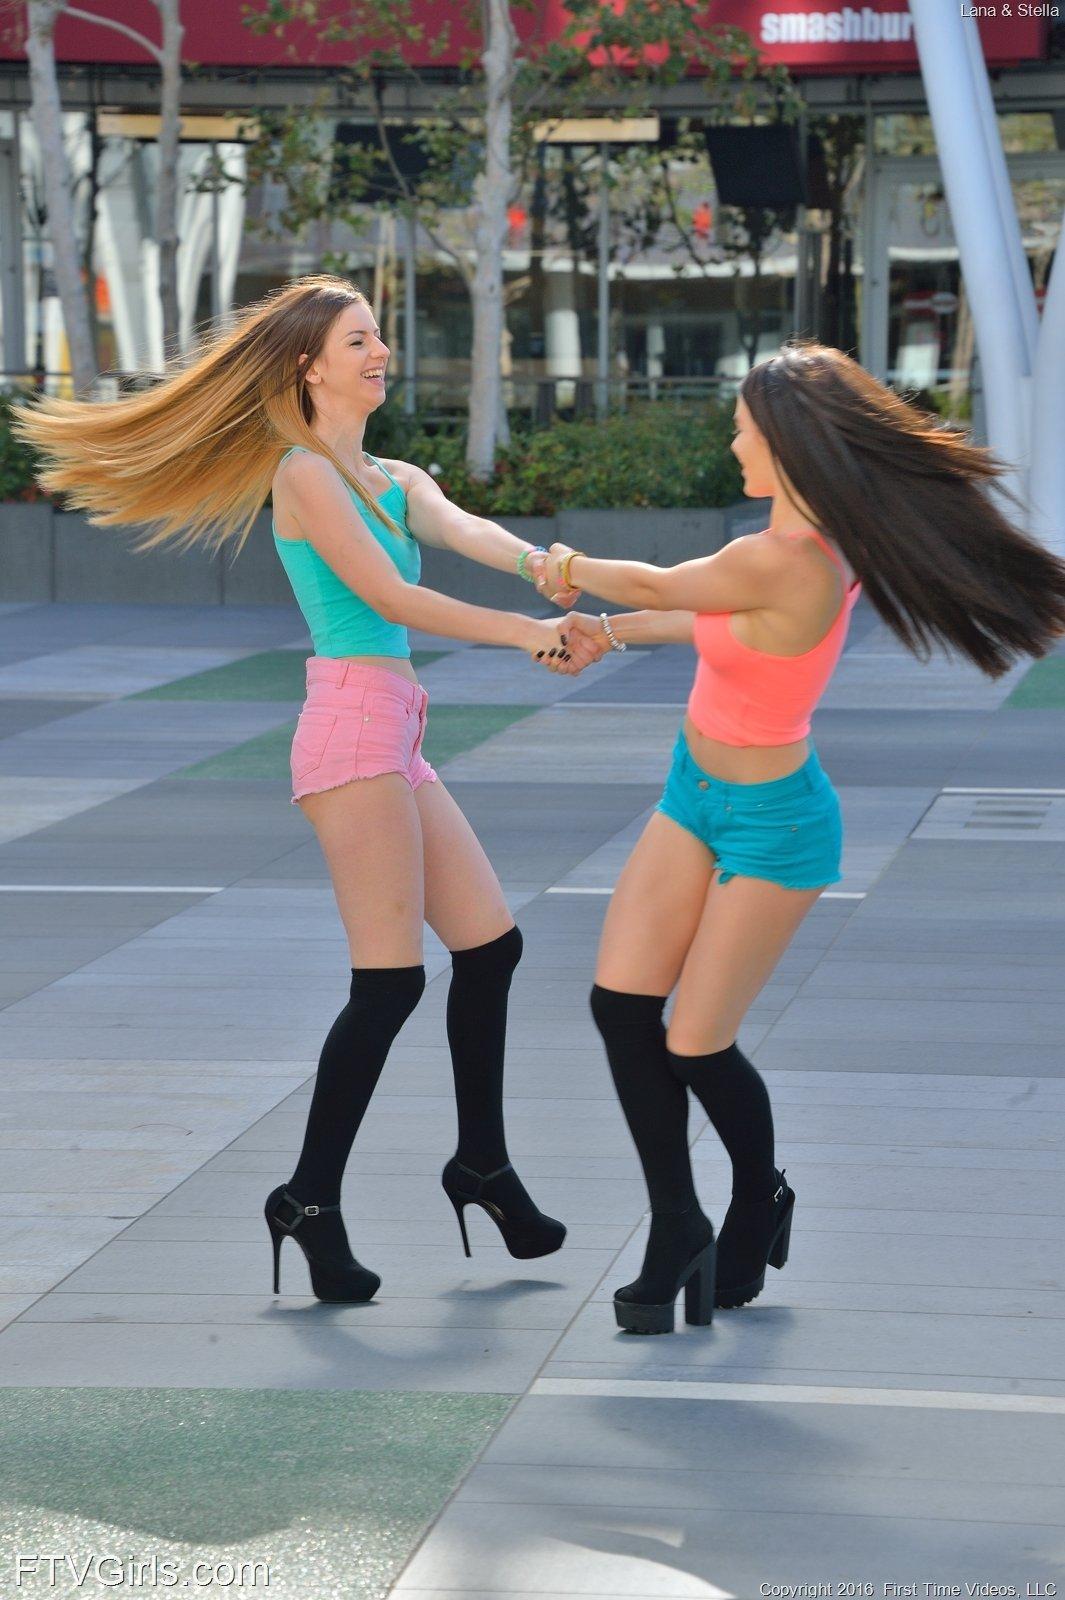 lana-stella-public-lesbian-shorts-nude-ftvgirls-15